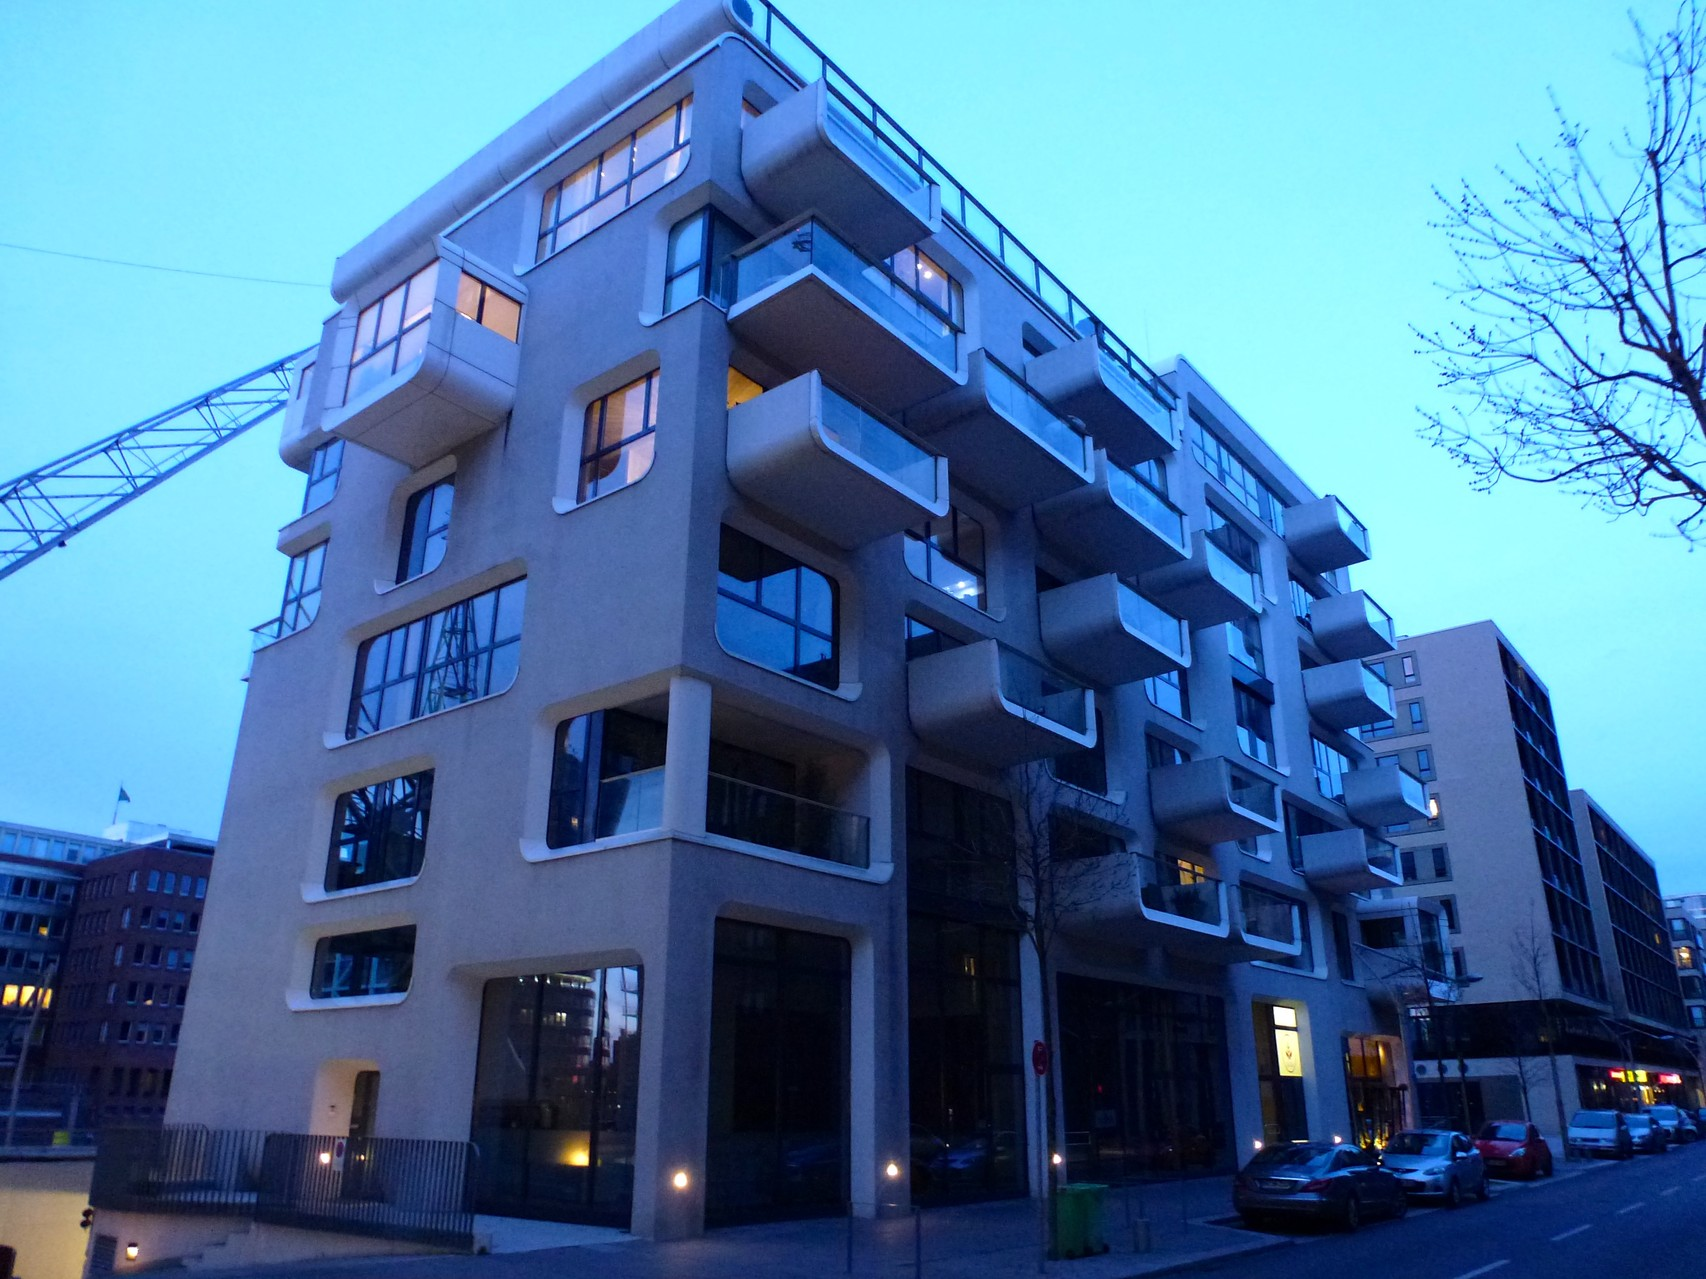 Wohnhaus Am Kaiserkai